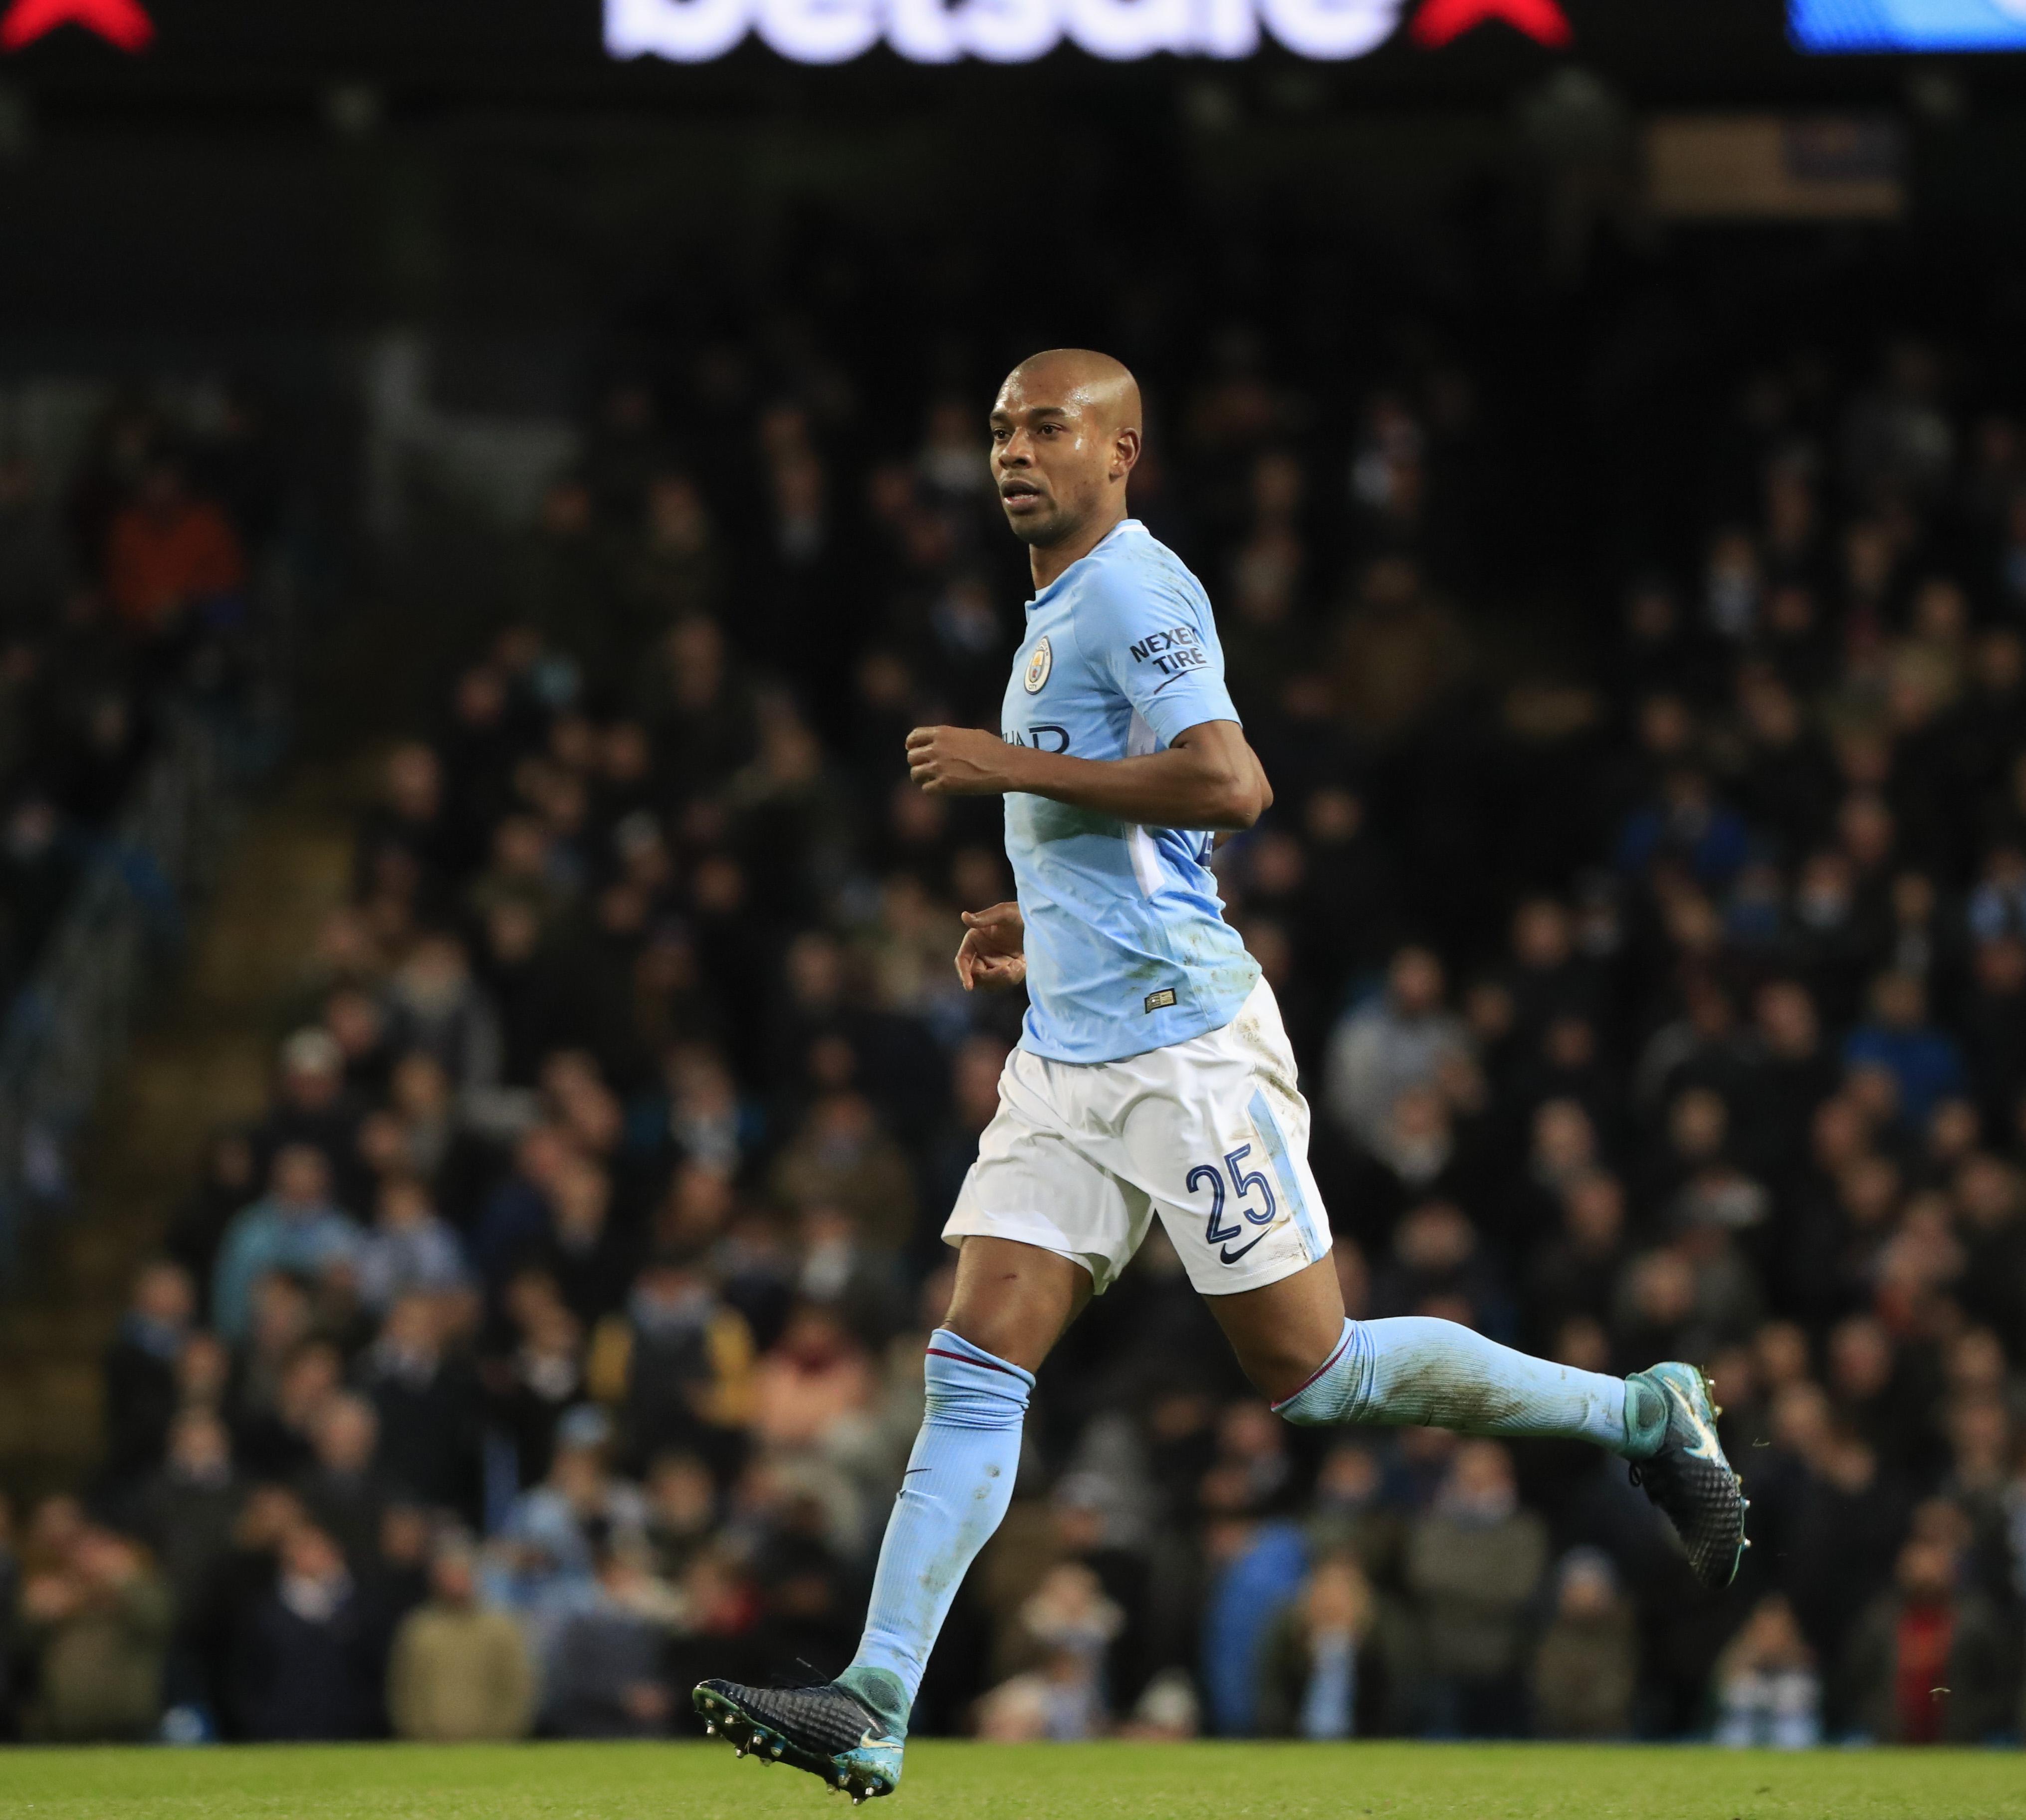 Football - Etranger - League Cup : Manchester City - Bristol en direct